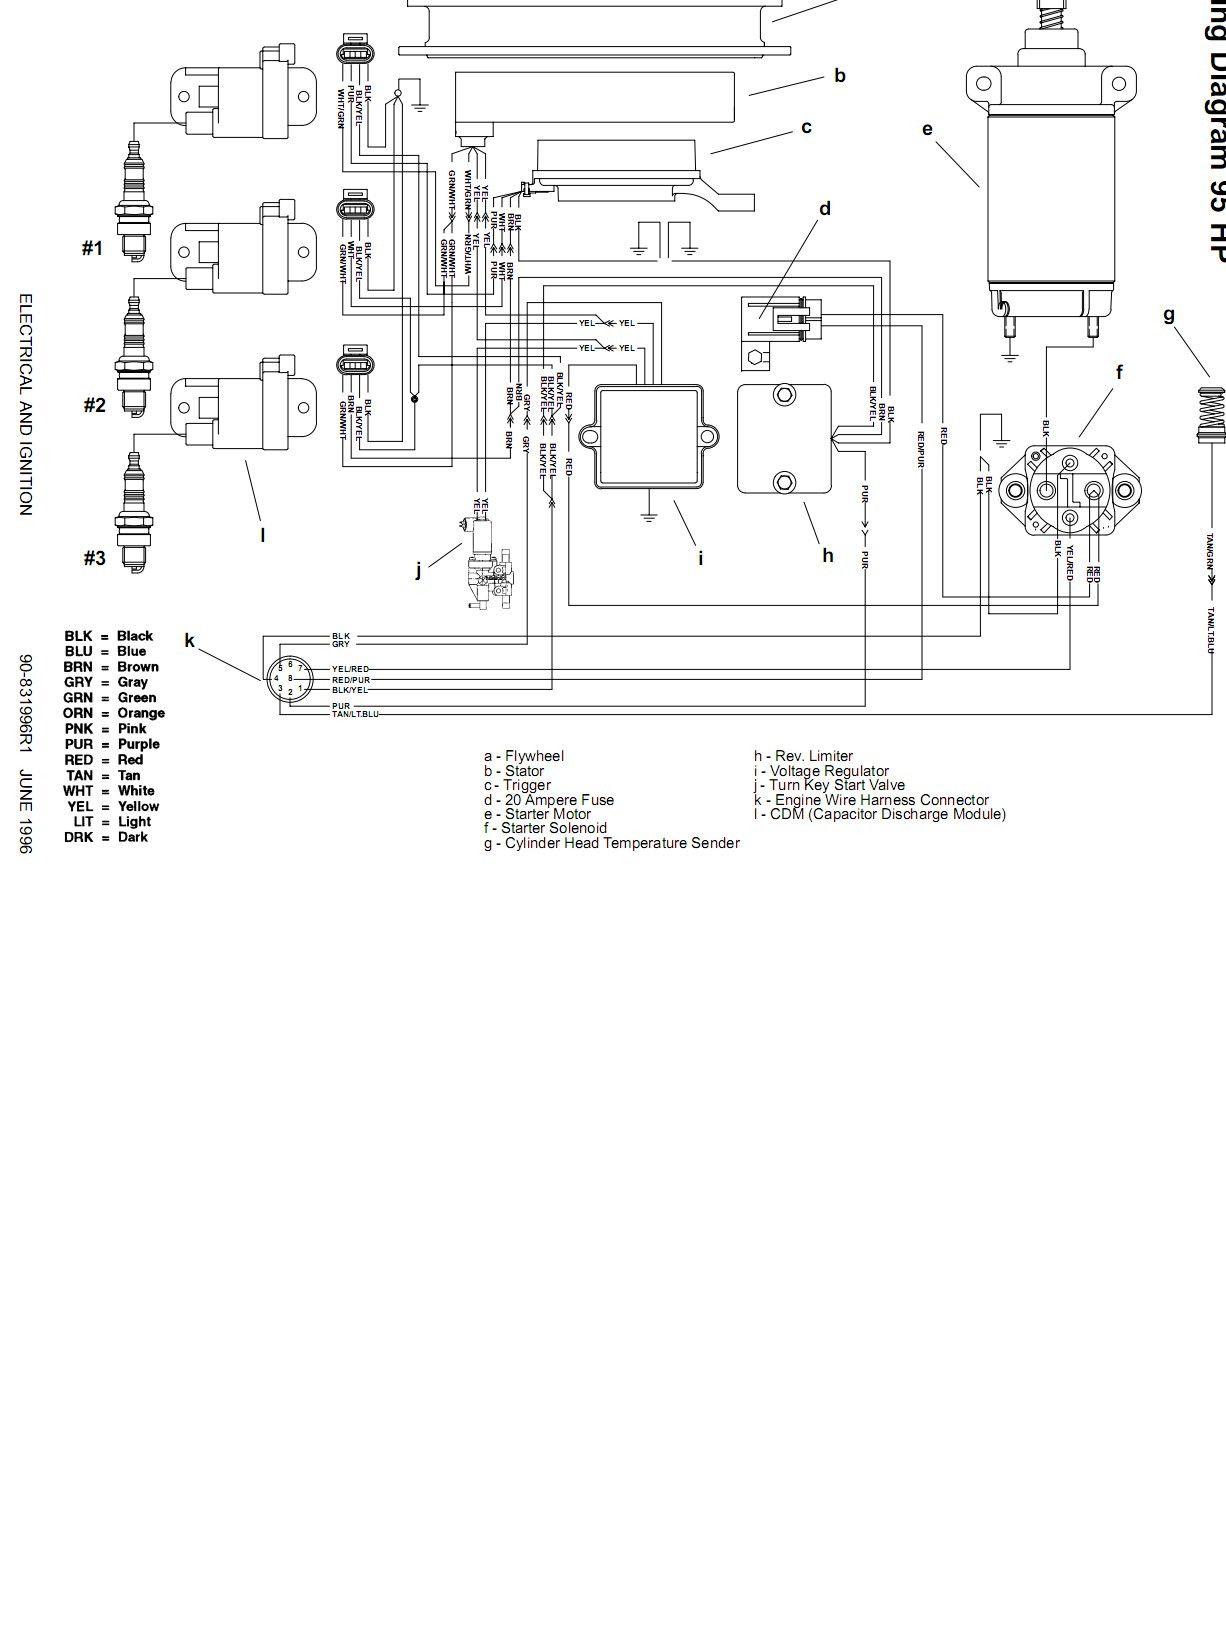 50 Wiring Diagram For Mercury Outboard Motor Yc0r Di